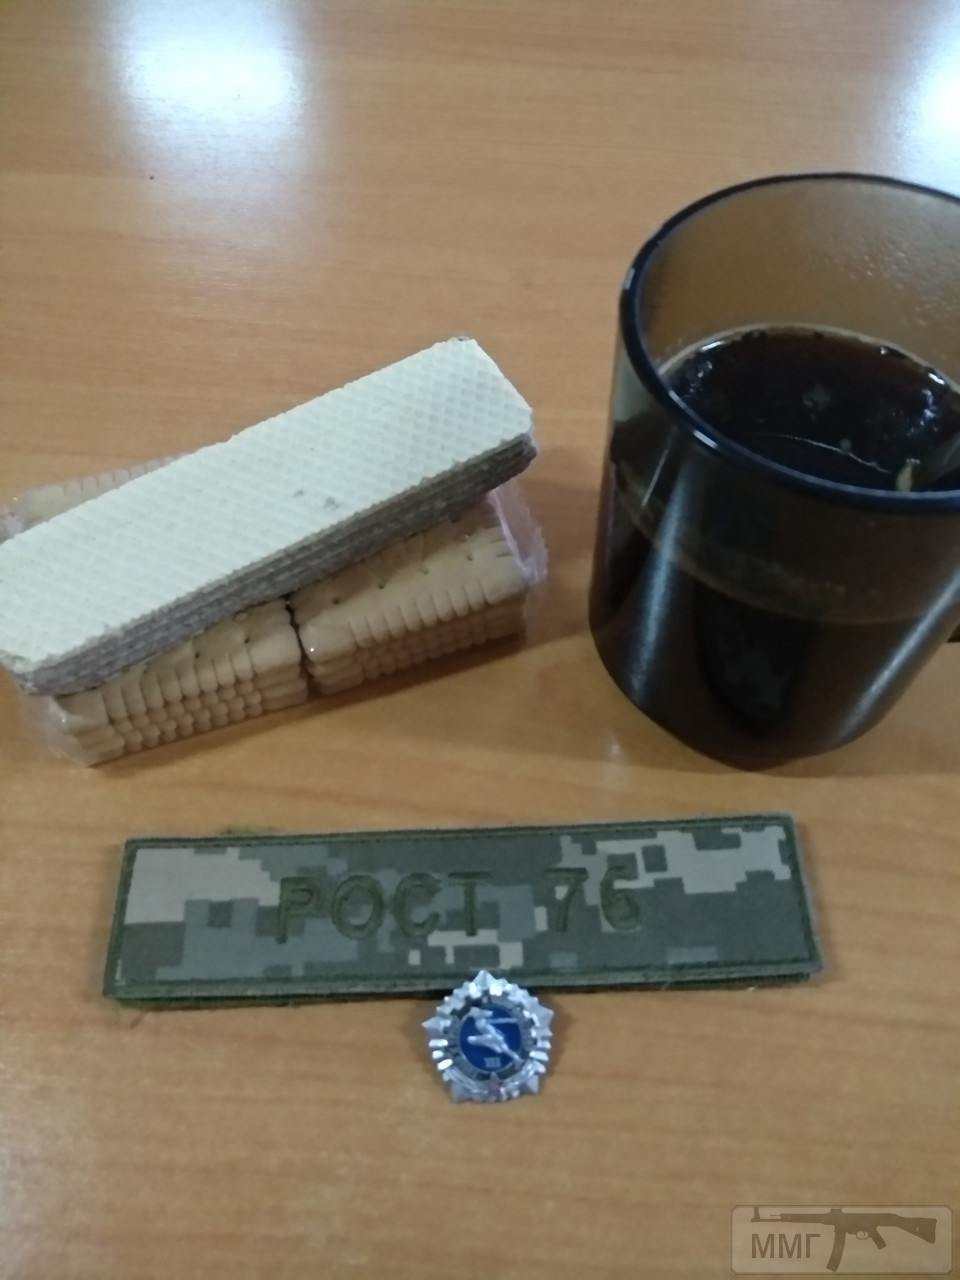 92645 - Копарські дні і будні.